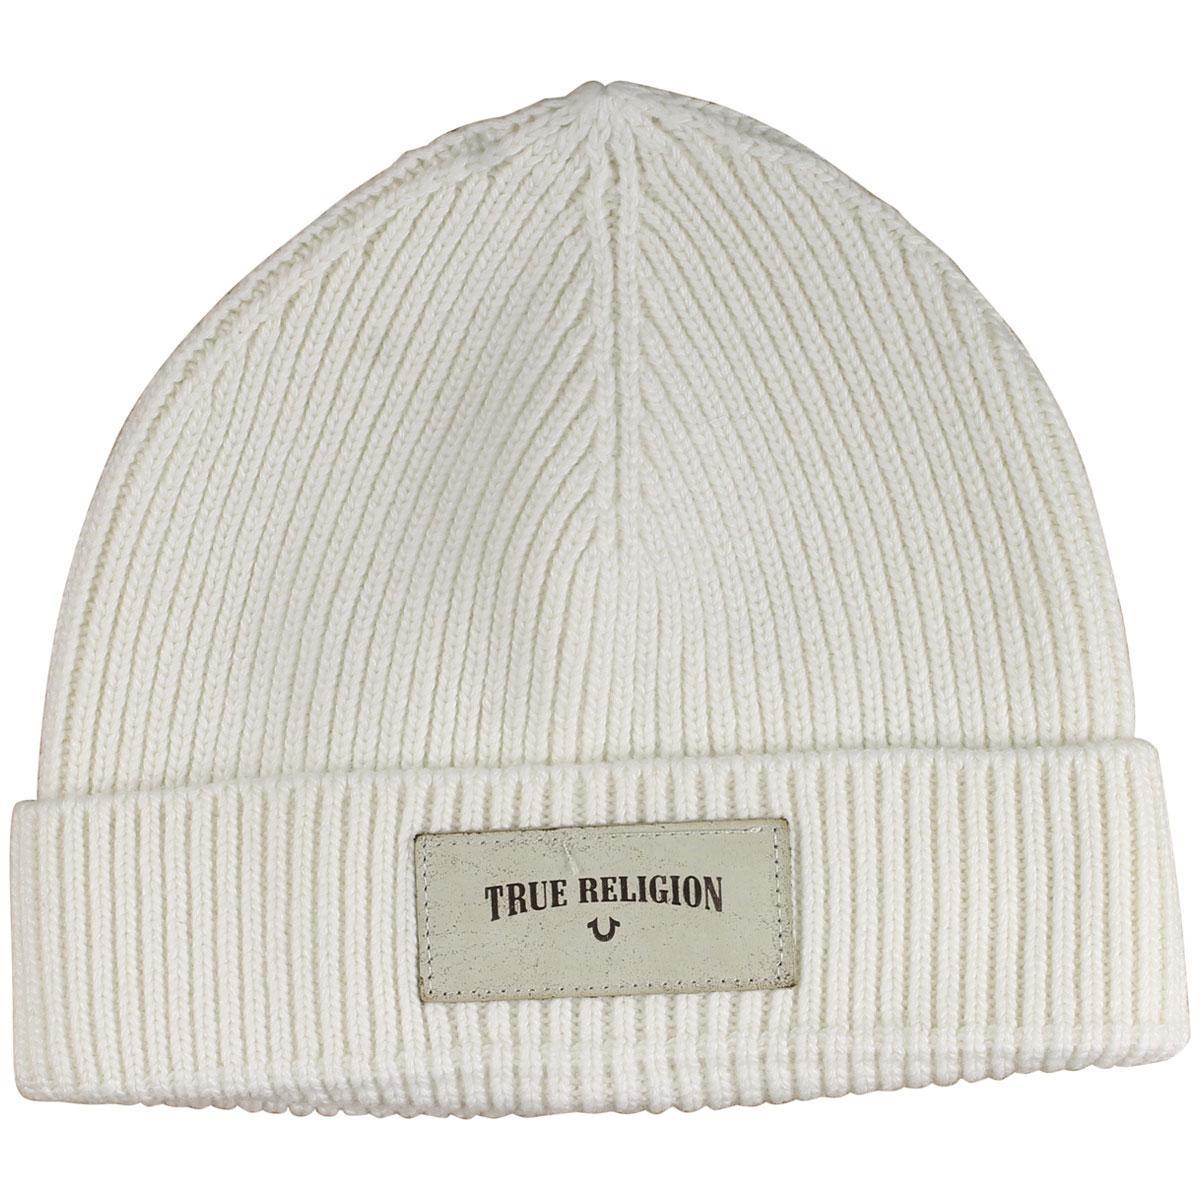 efc6cf8ec True Religion Men's Ribbed Knit Watchcap Hat